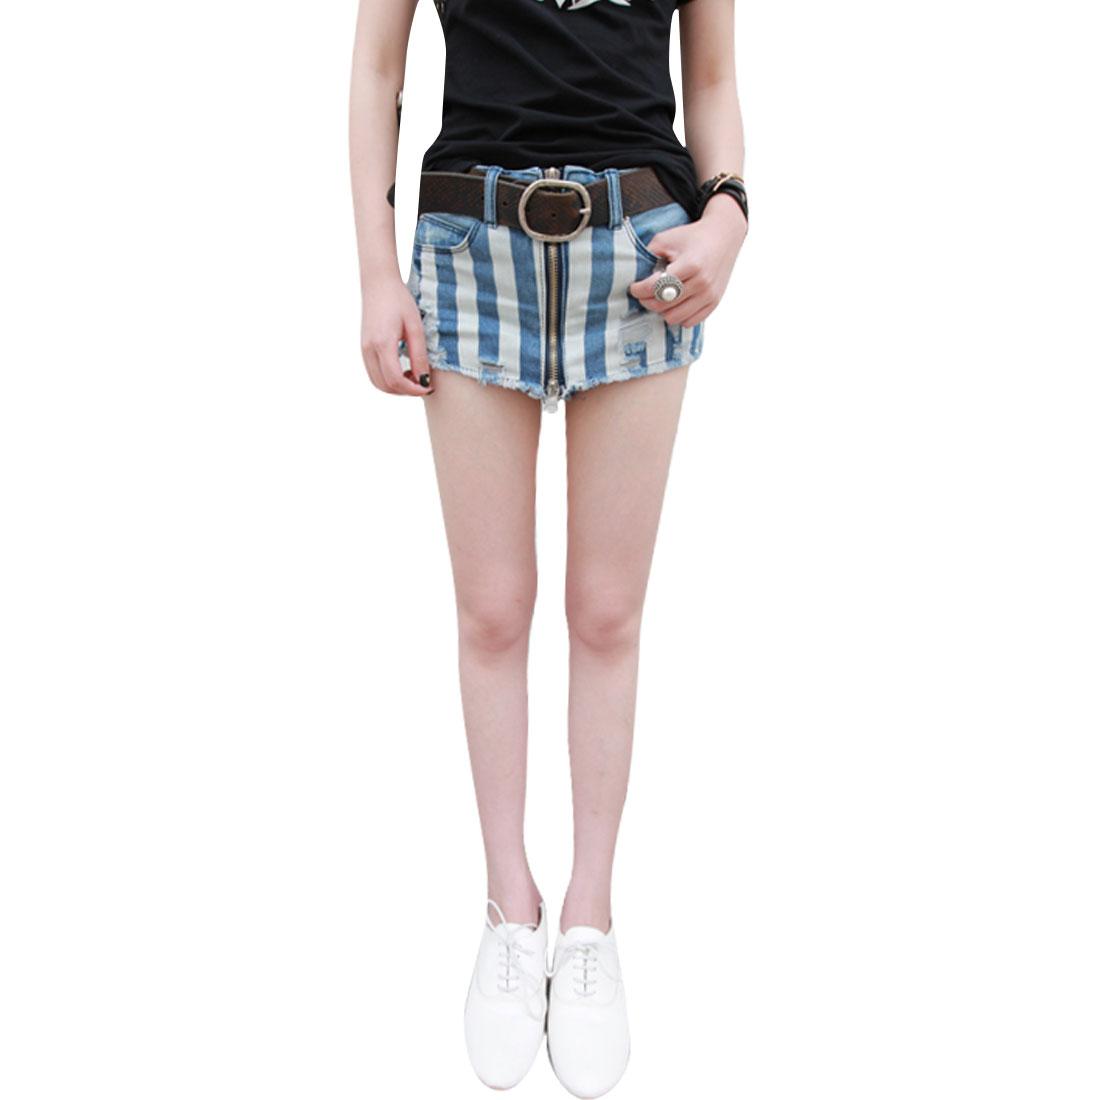 Women Belt Loops Five Pockets Stripes Pattern Skorts Shorts Light Blue S